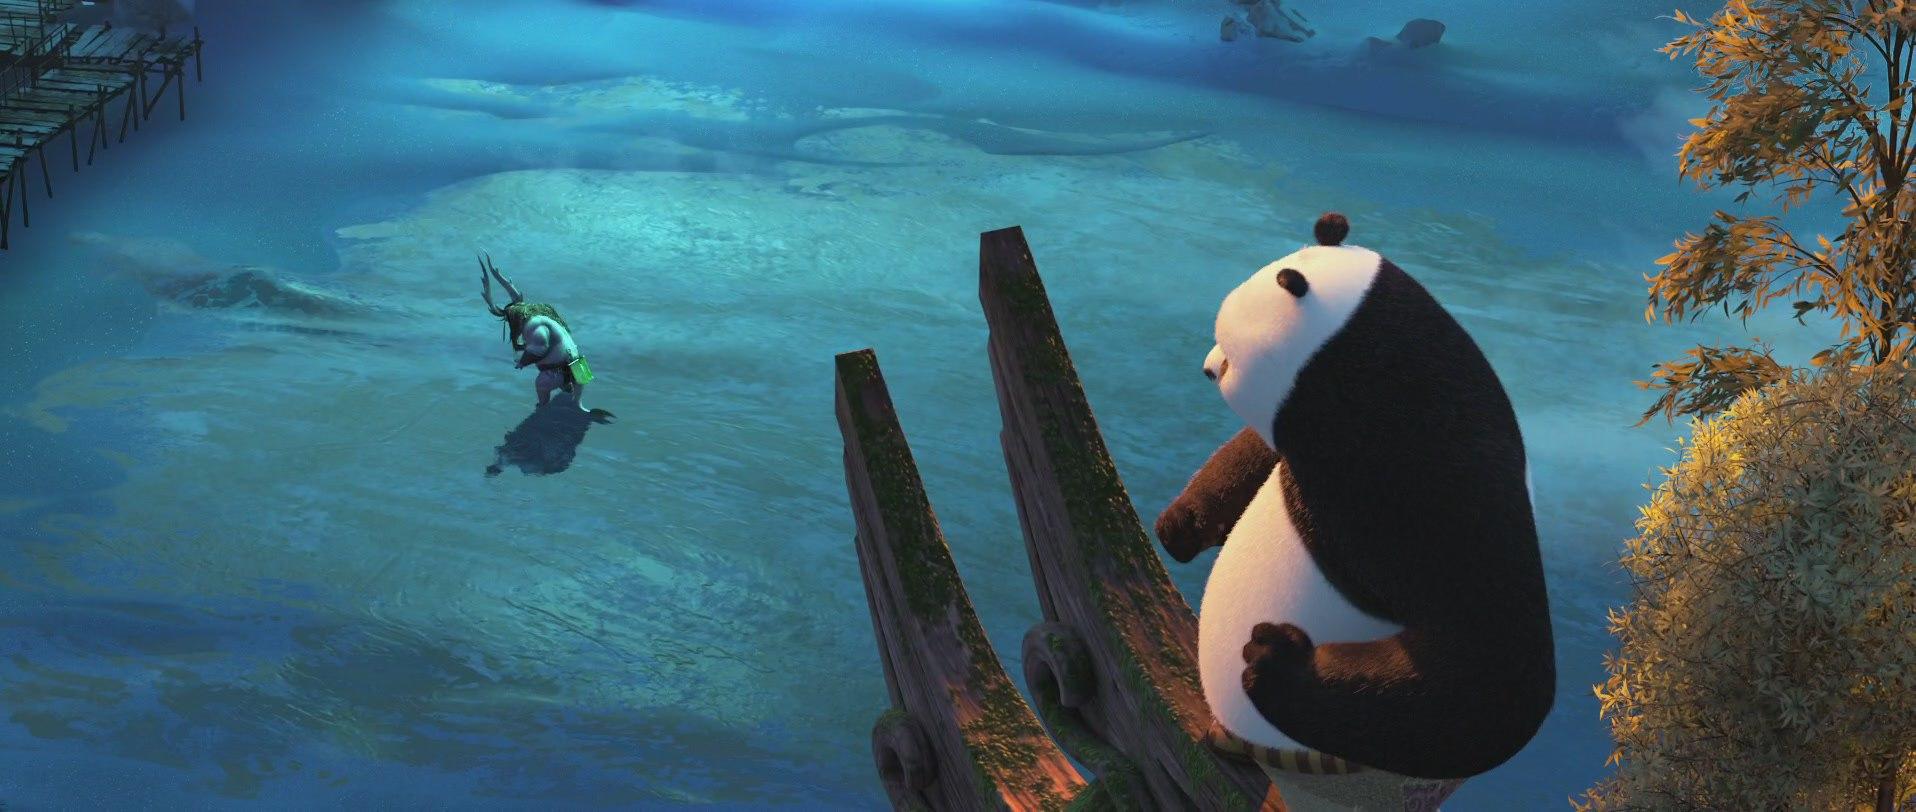 панда кунг-фу готовится к атаке